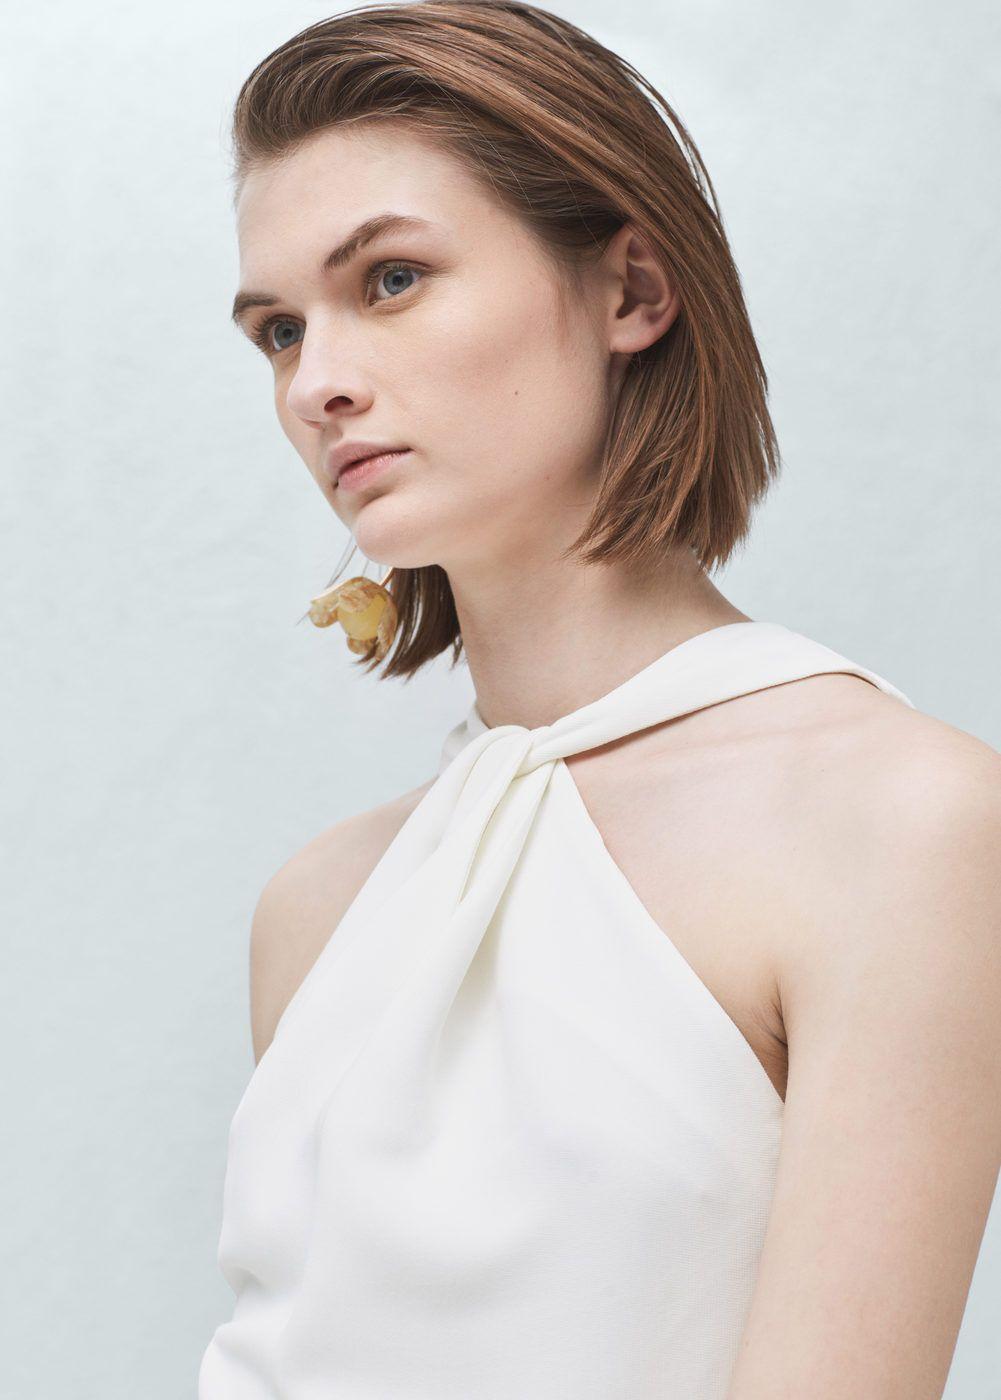 Ocbrdxew Halter Vestido Pinterest Mujermoda Dresses Joven Cuello TcuF5KJ13l